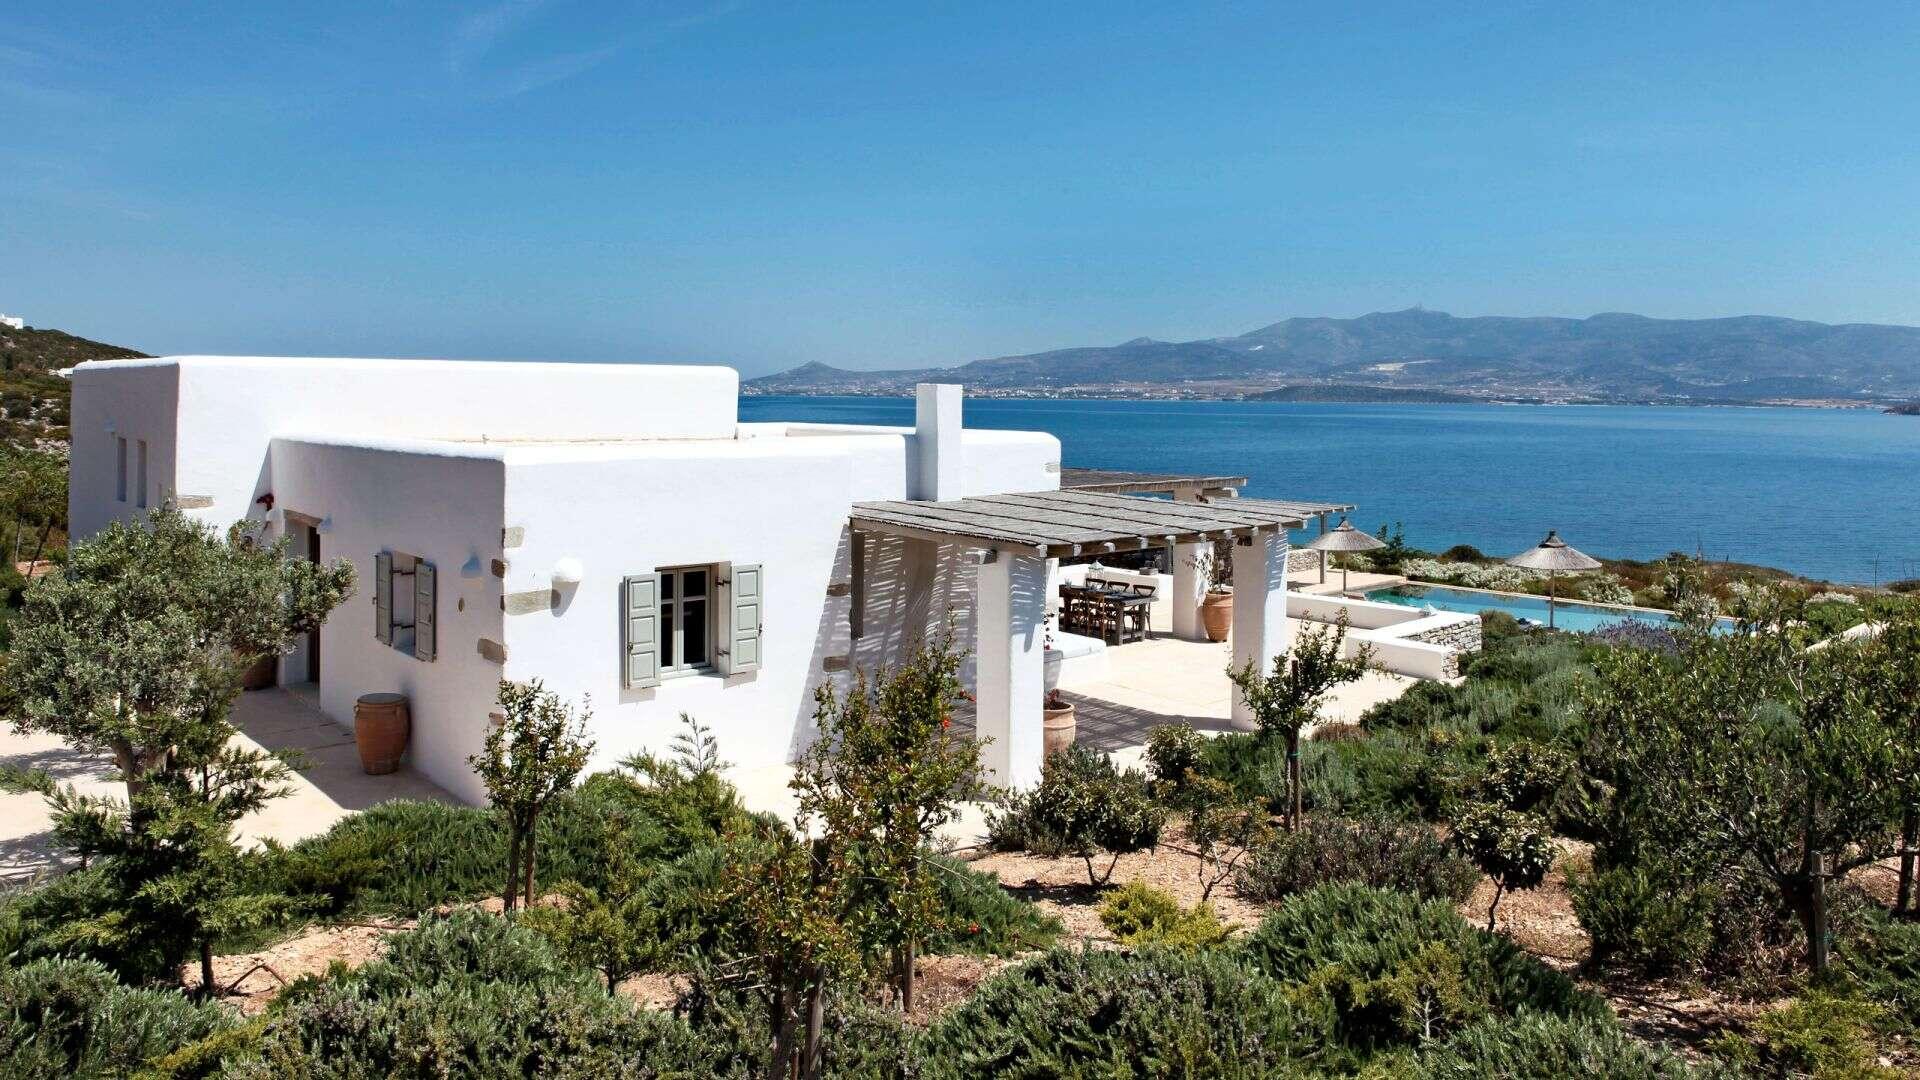 Luxury vacation rentals europe - Greece - Antiparos - Magganies - Acanthus - Image 1/10